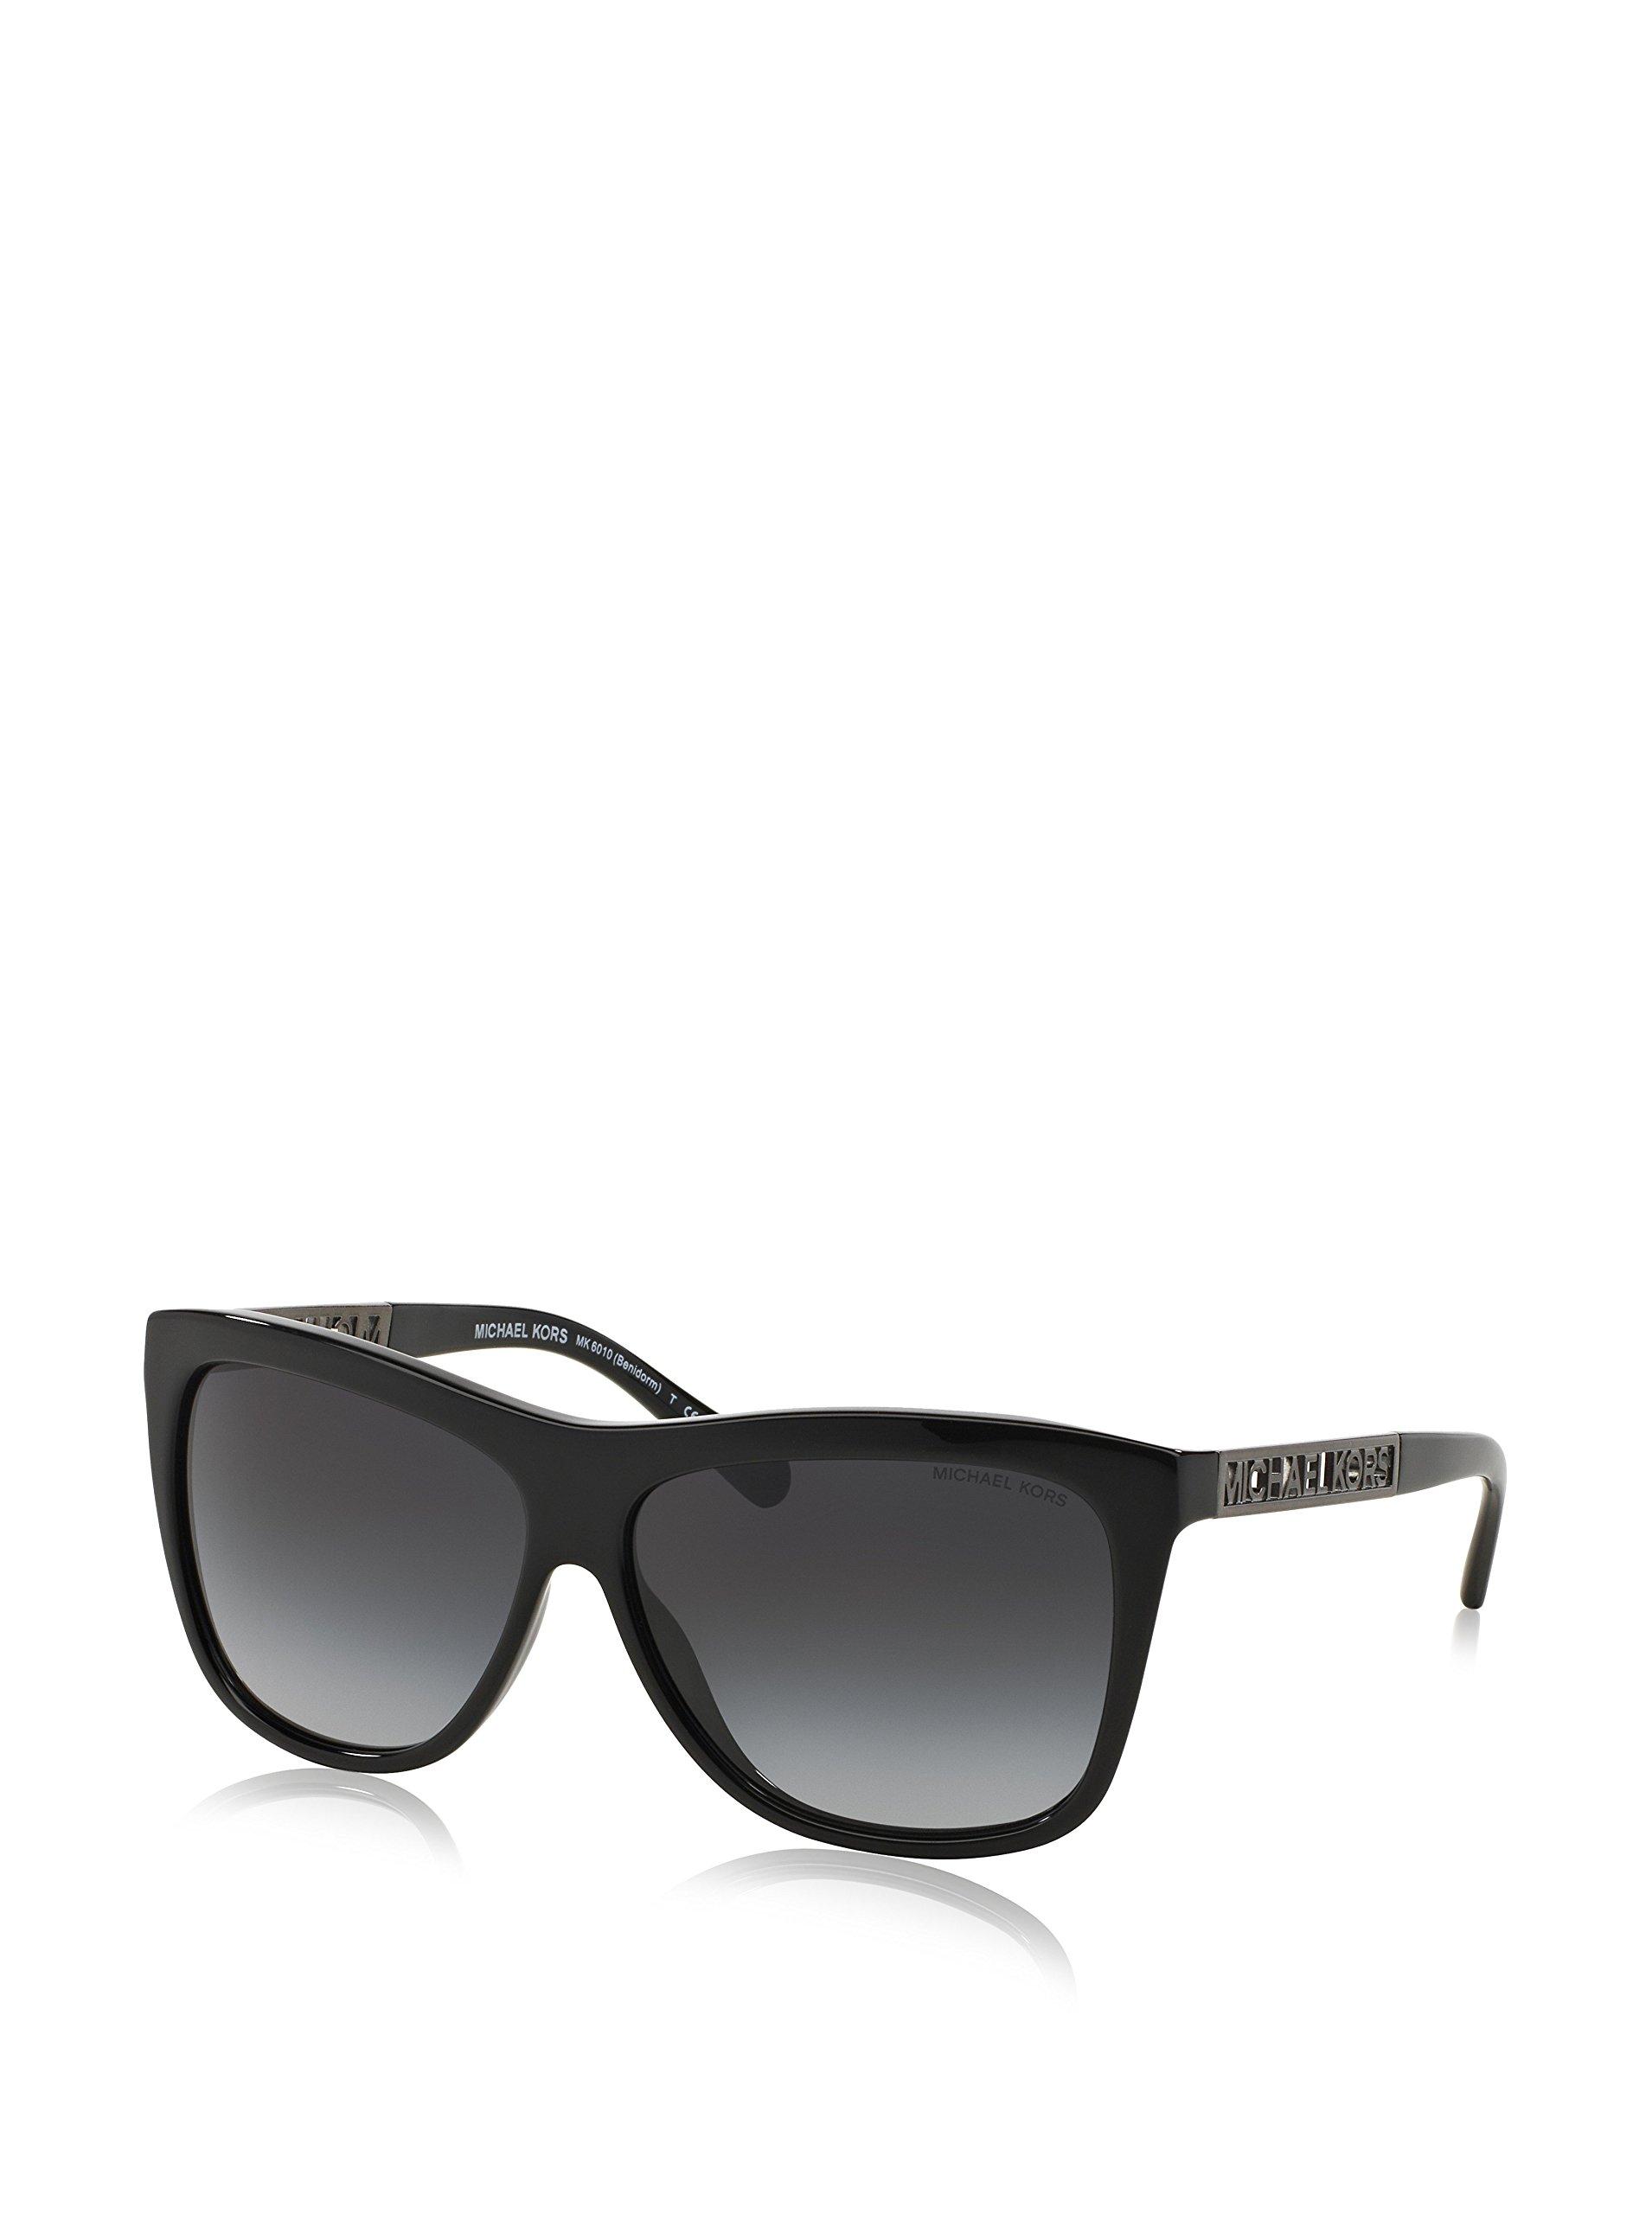 Michael Kors Womens Benidorm Sunglasses (MK6010) Black/Grey Acetate - Non-Polarized - 59mm